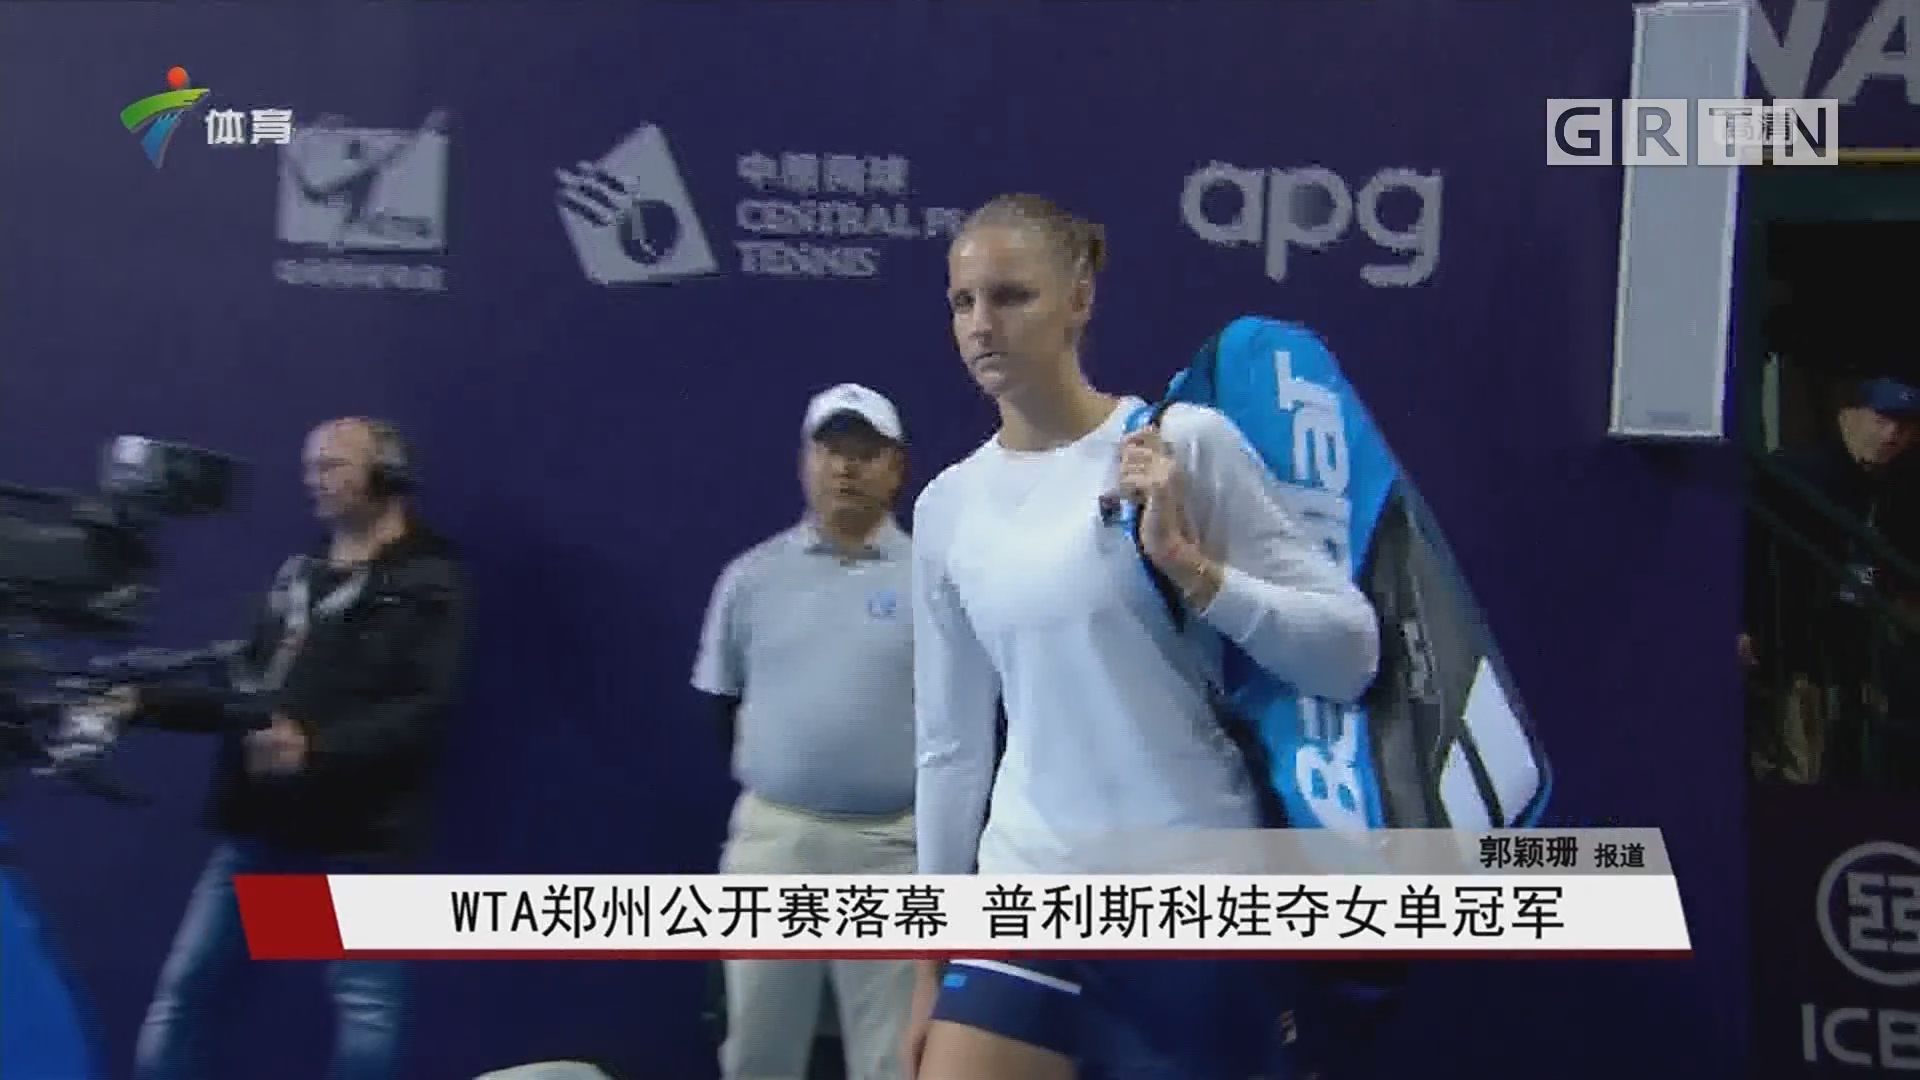 WTA郑州公开赛落幕 普利斯科娃夺女单冠军